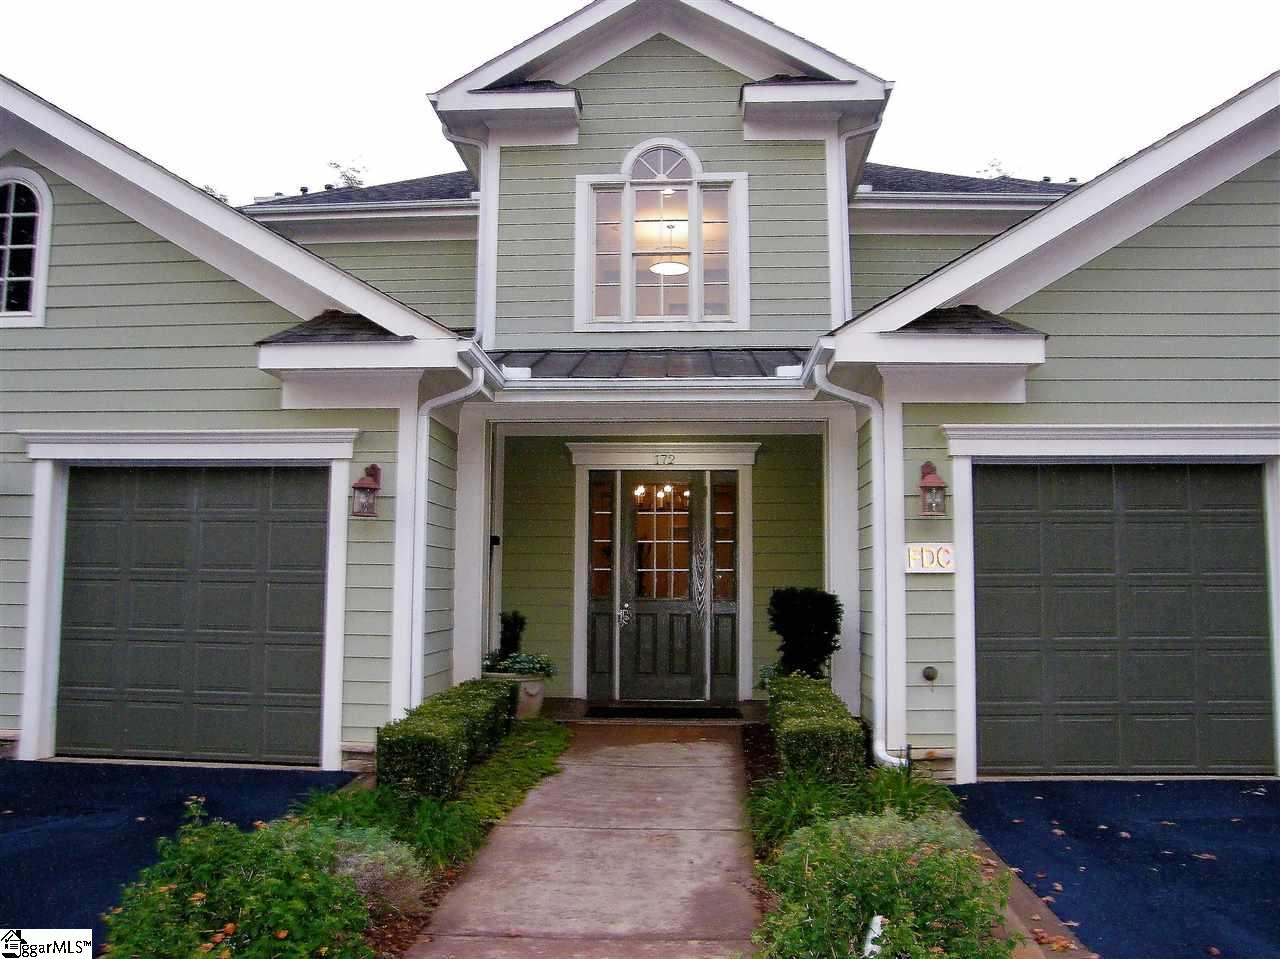 172 Ridgeland Drive, Greenville, SC 29601